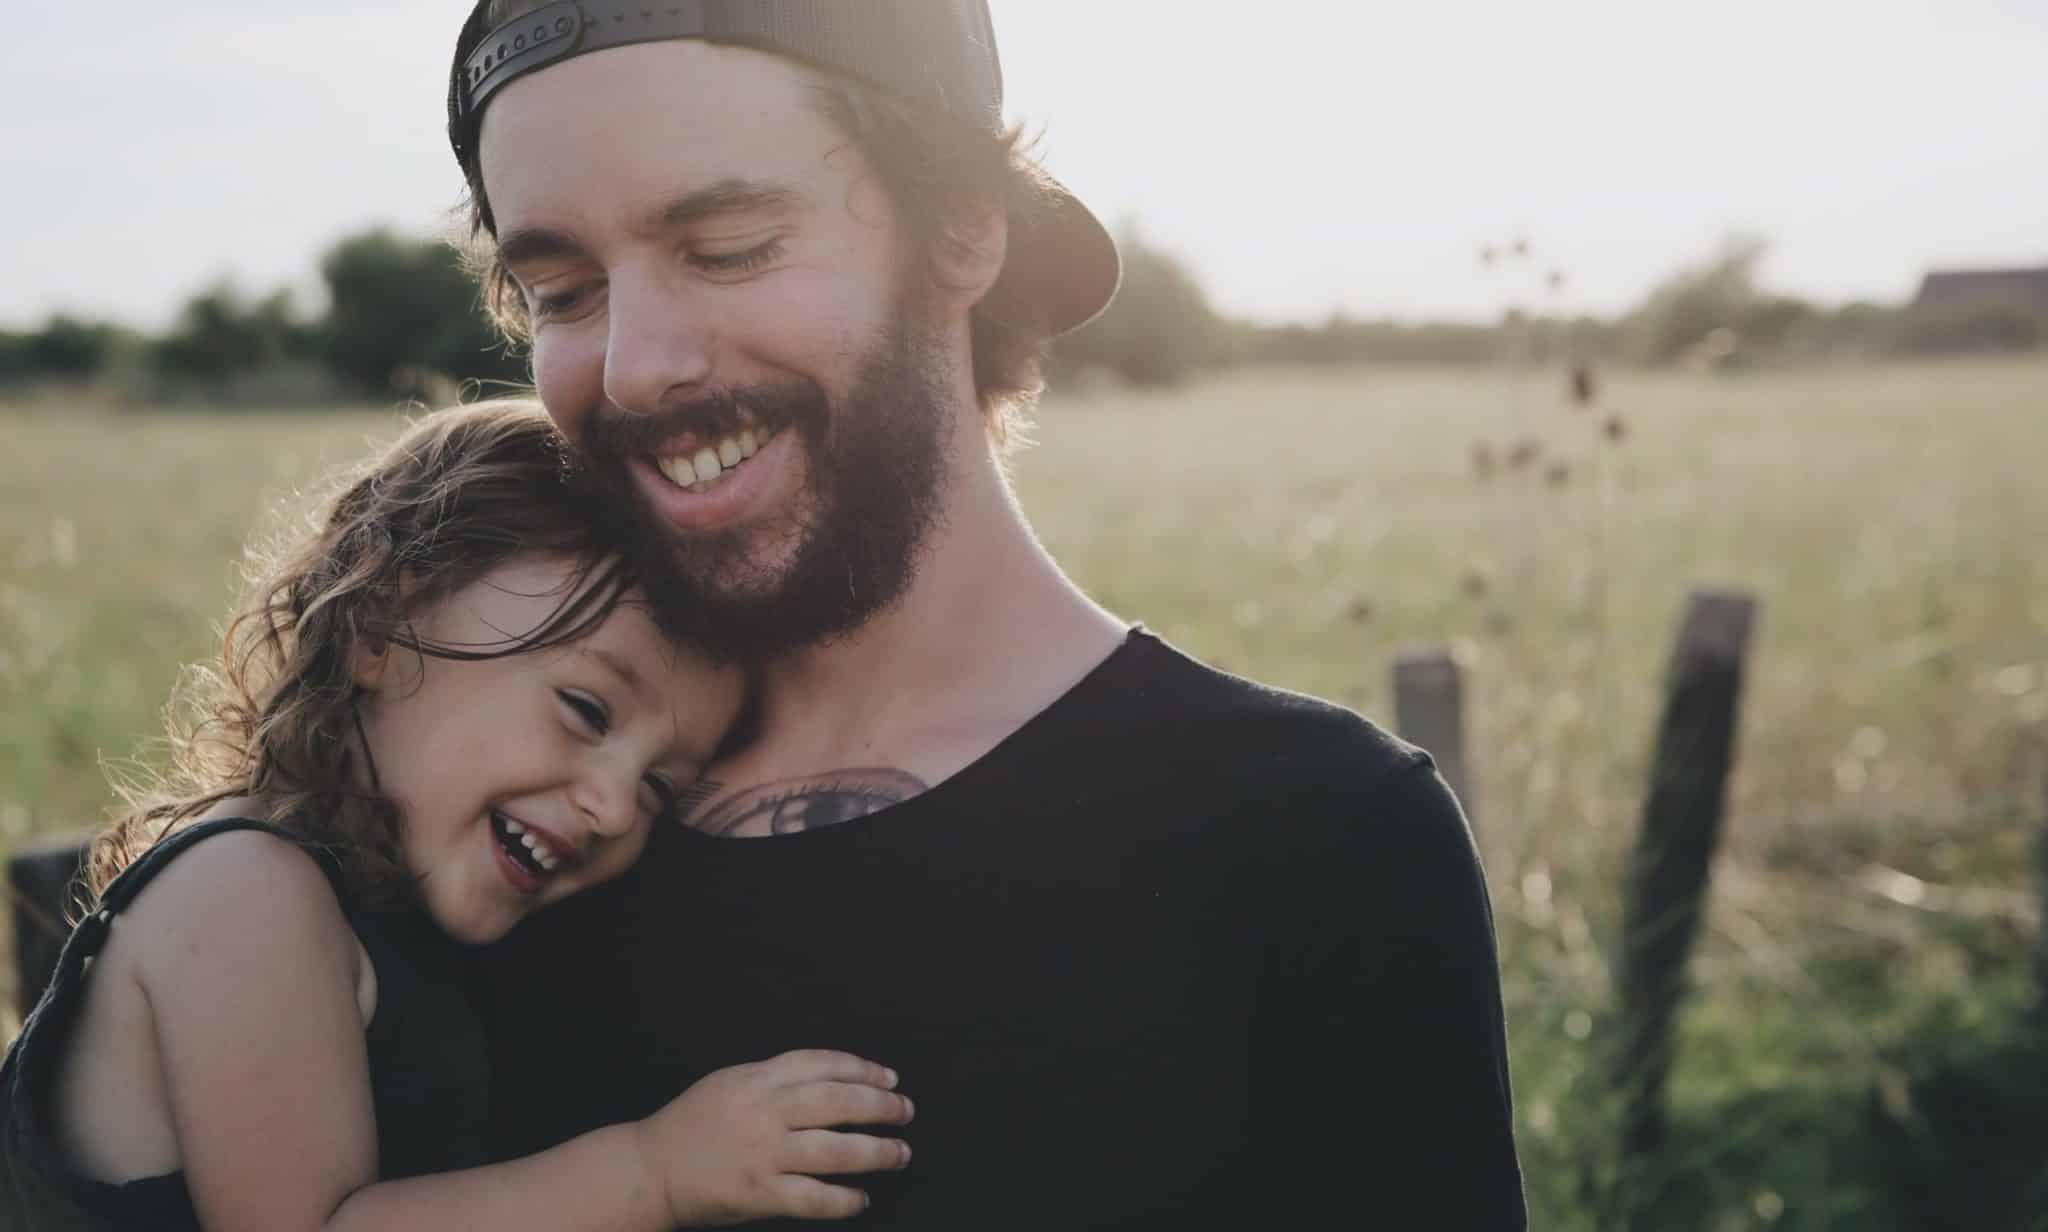 Tochter vater und Vater Tochter